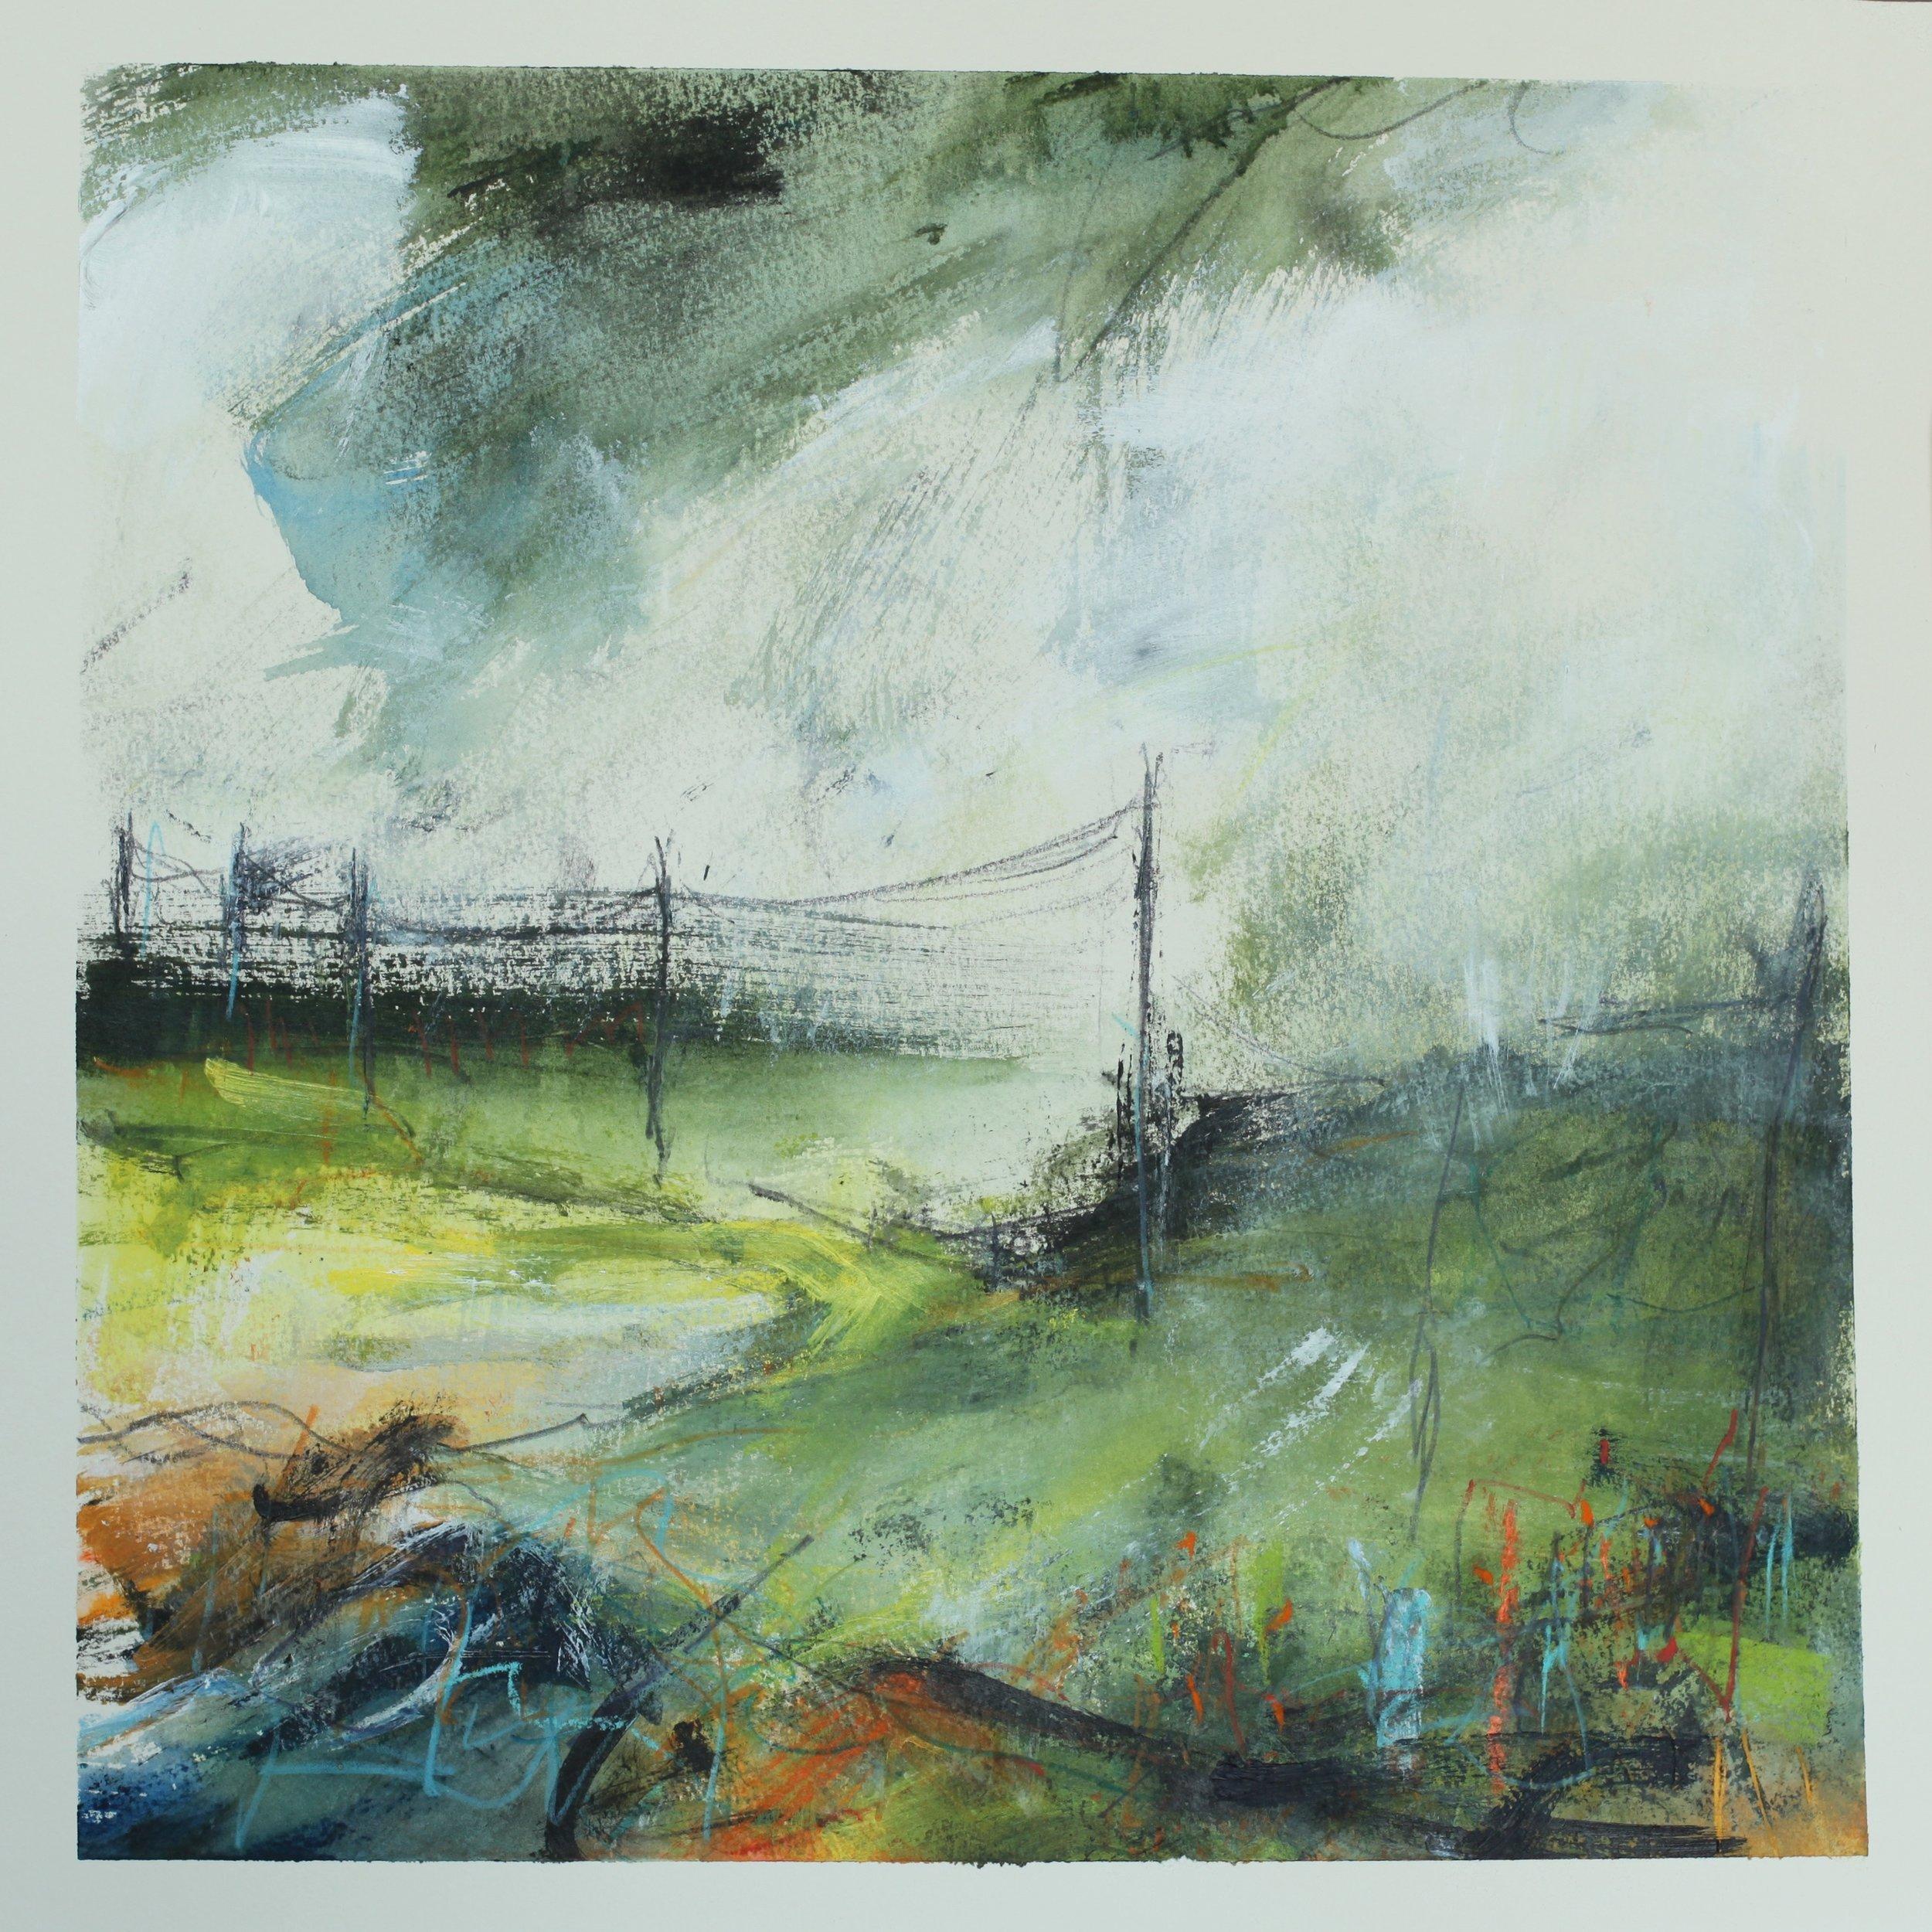 Across the downs, watercolour, 40 x 40cm